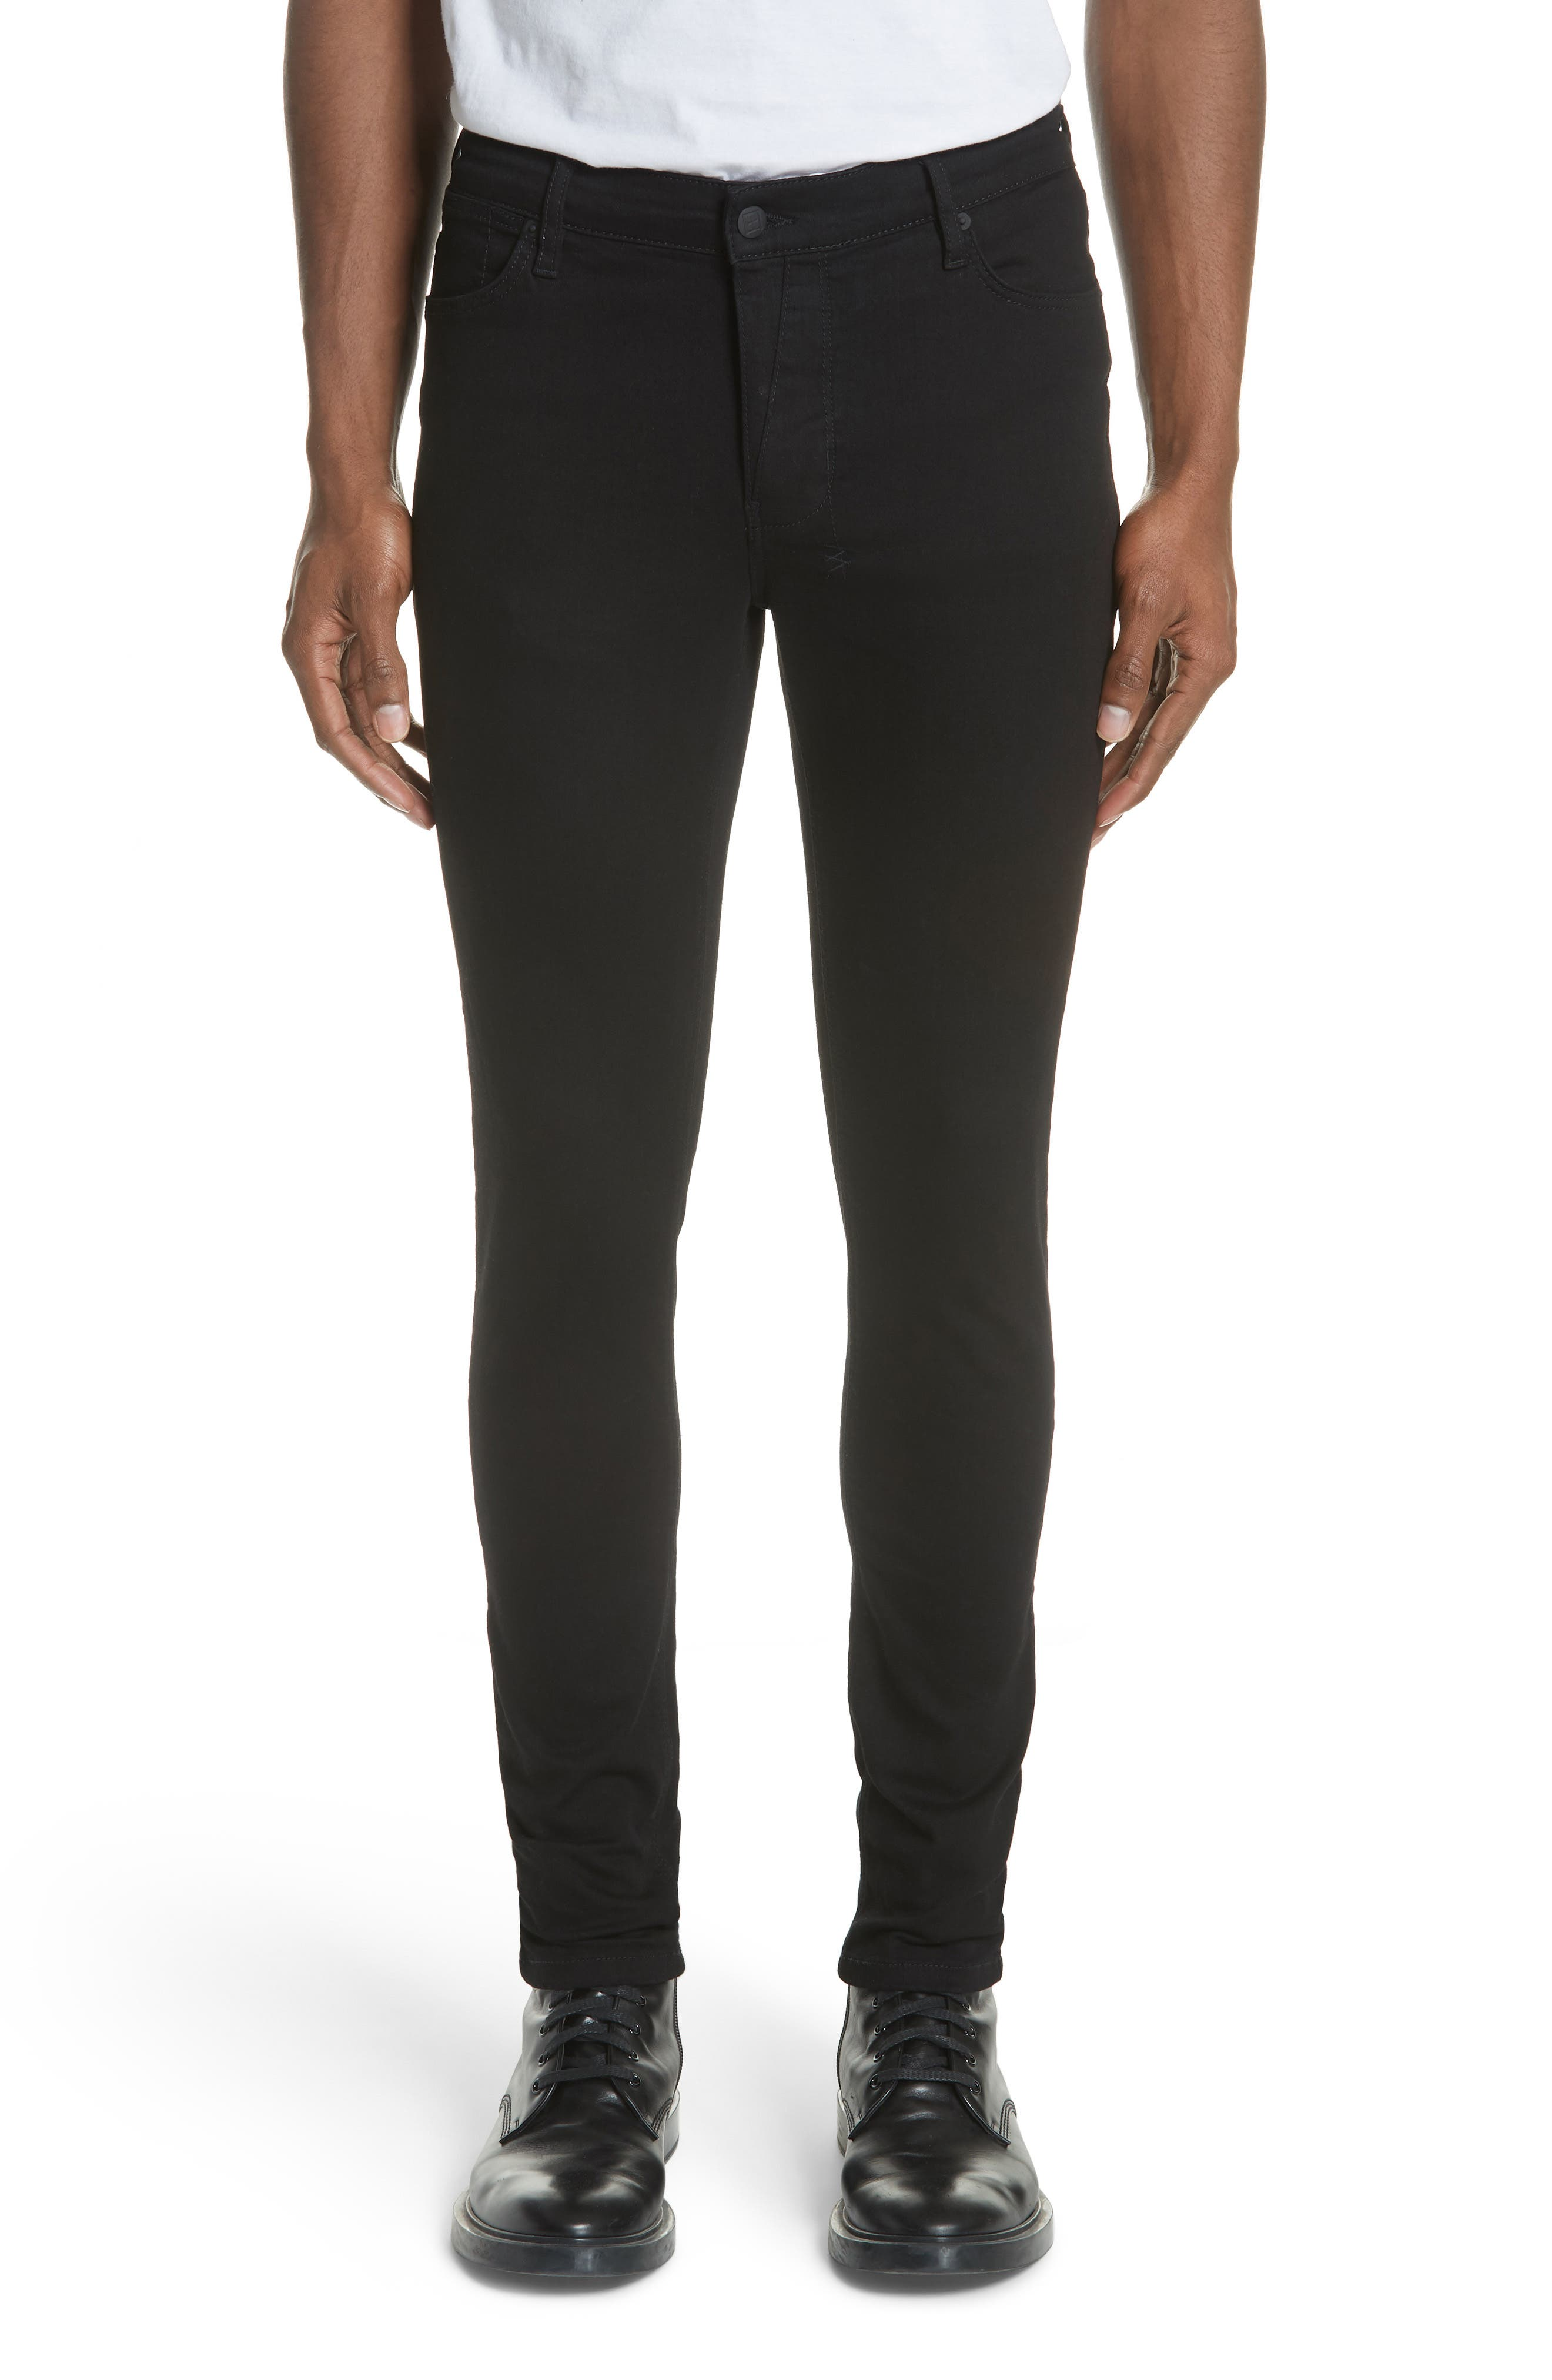 Van Winkle Black Rebel Skinny Fit Jeans,                             Main thumbnail 1, color,                             Black